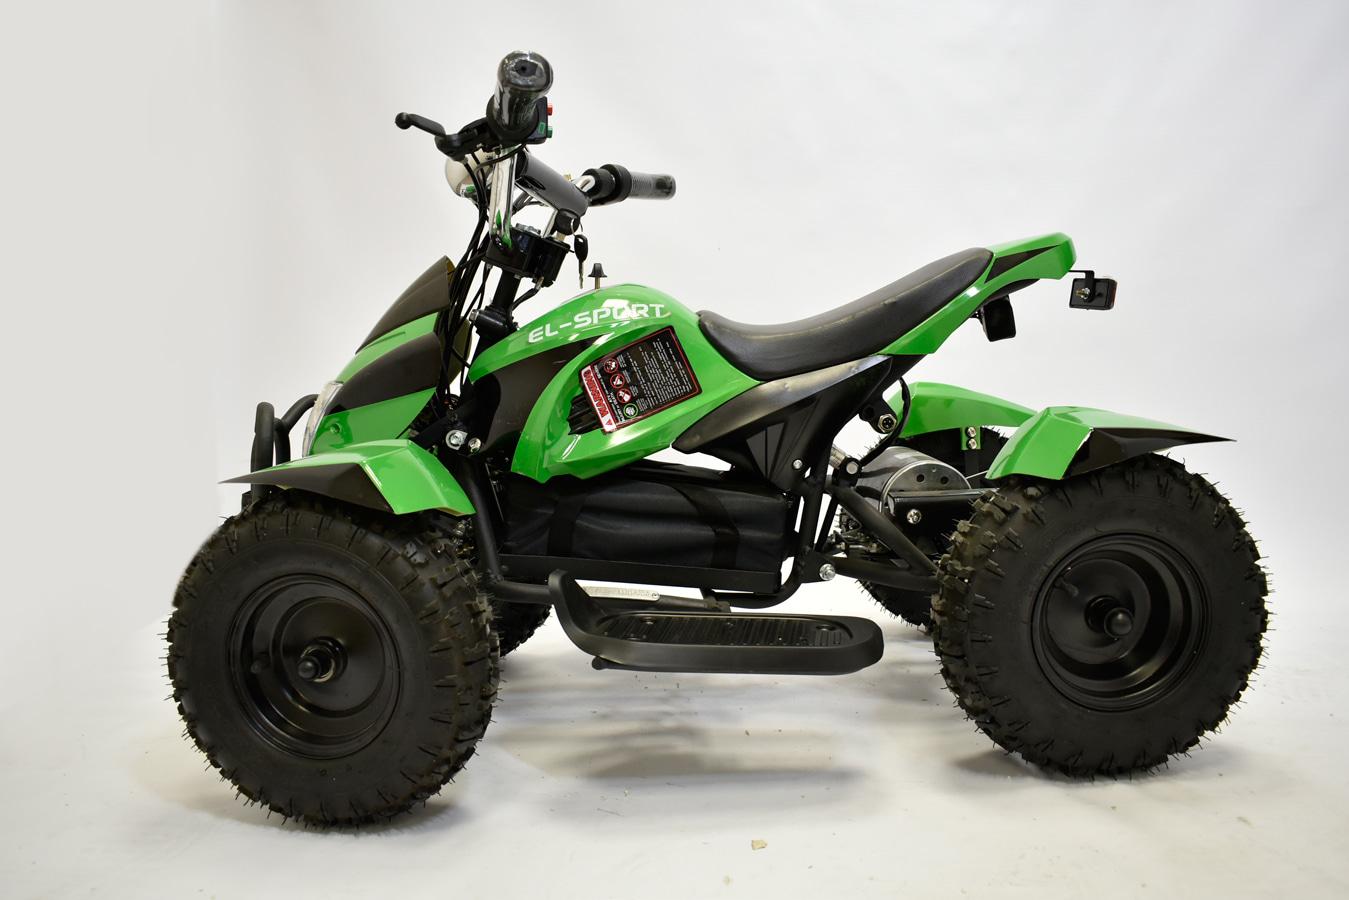 Электроквадроцикл El-sport Junior ATV фото